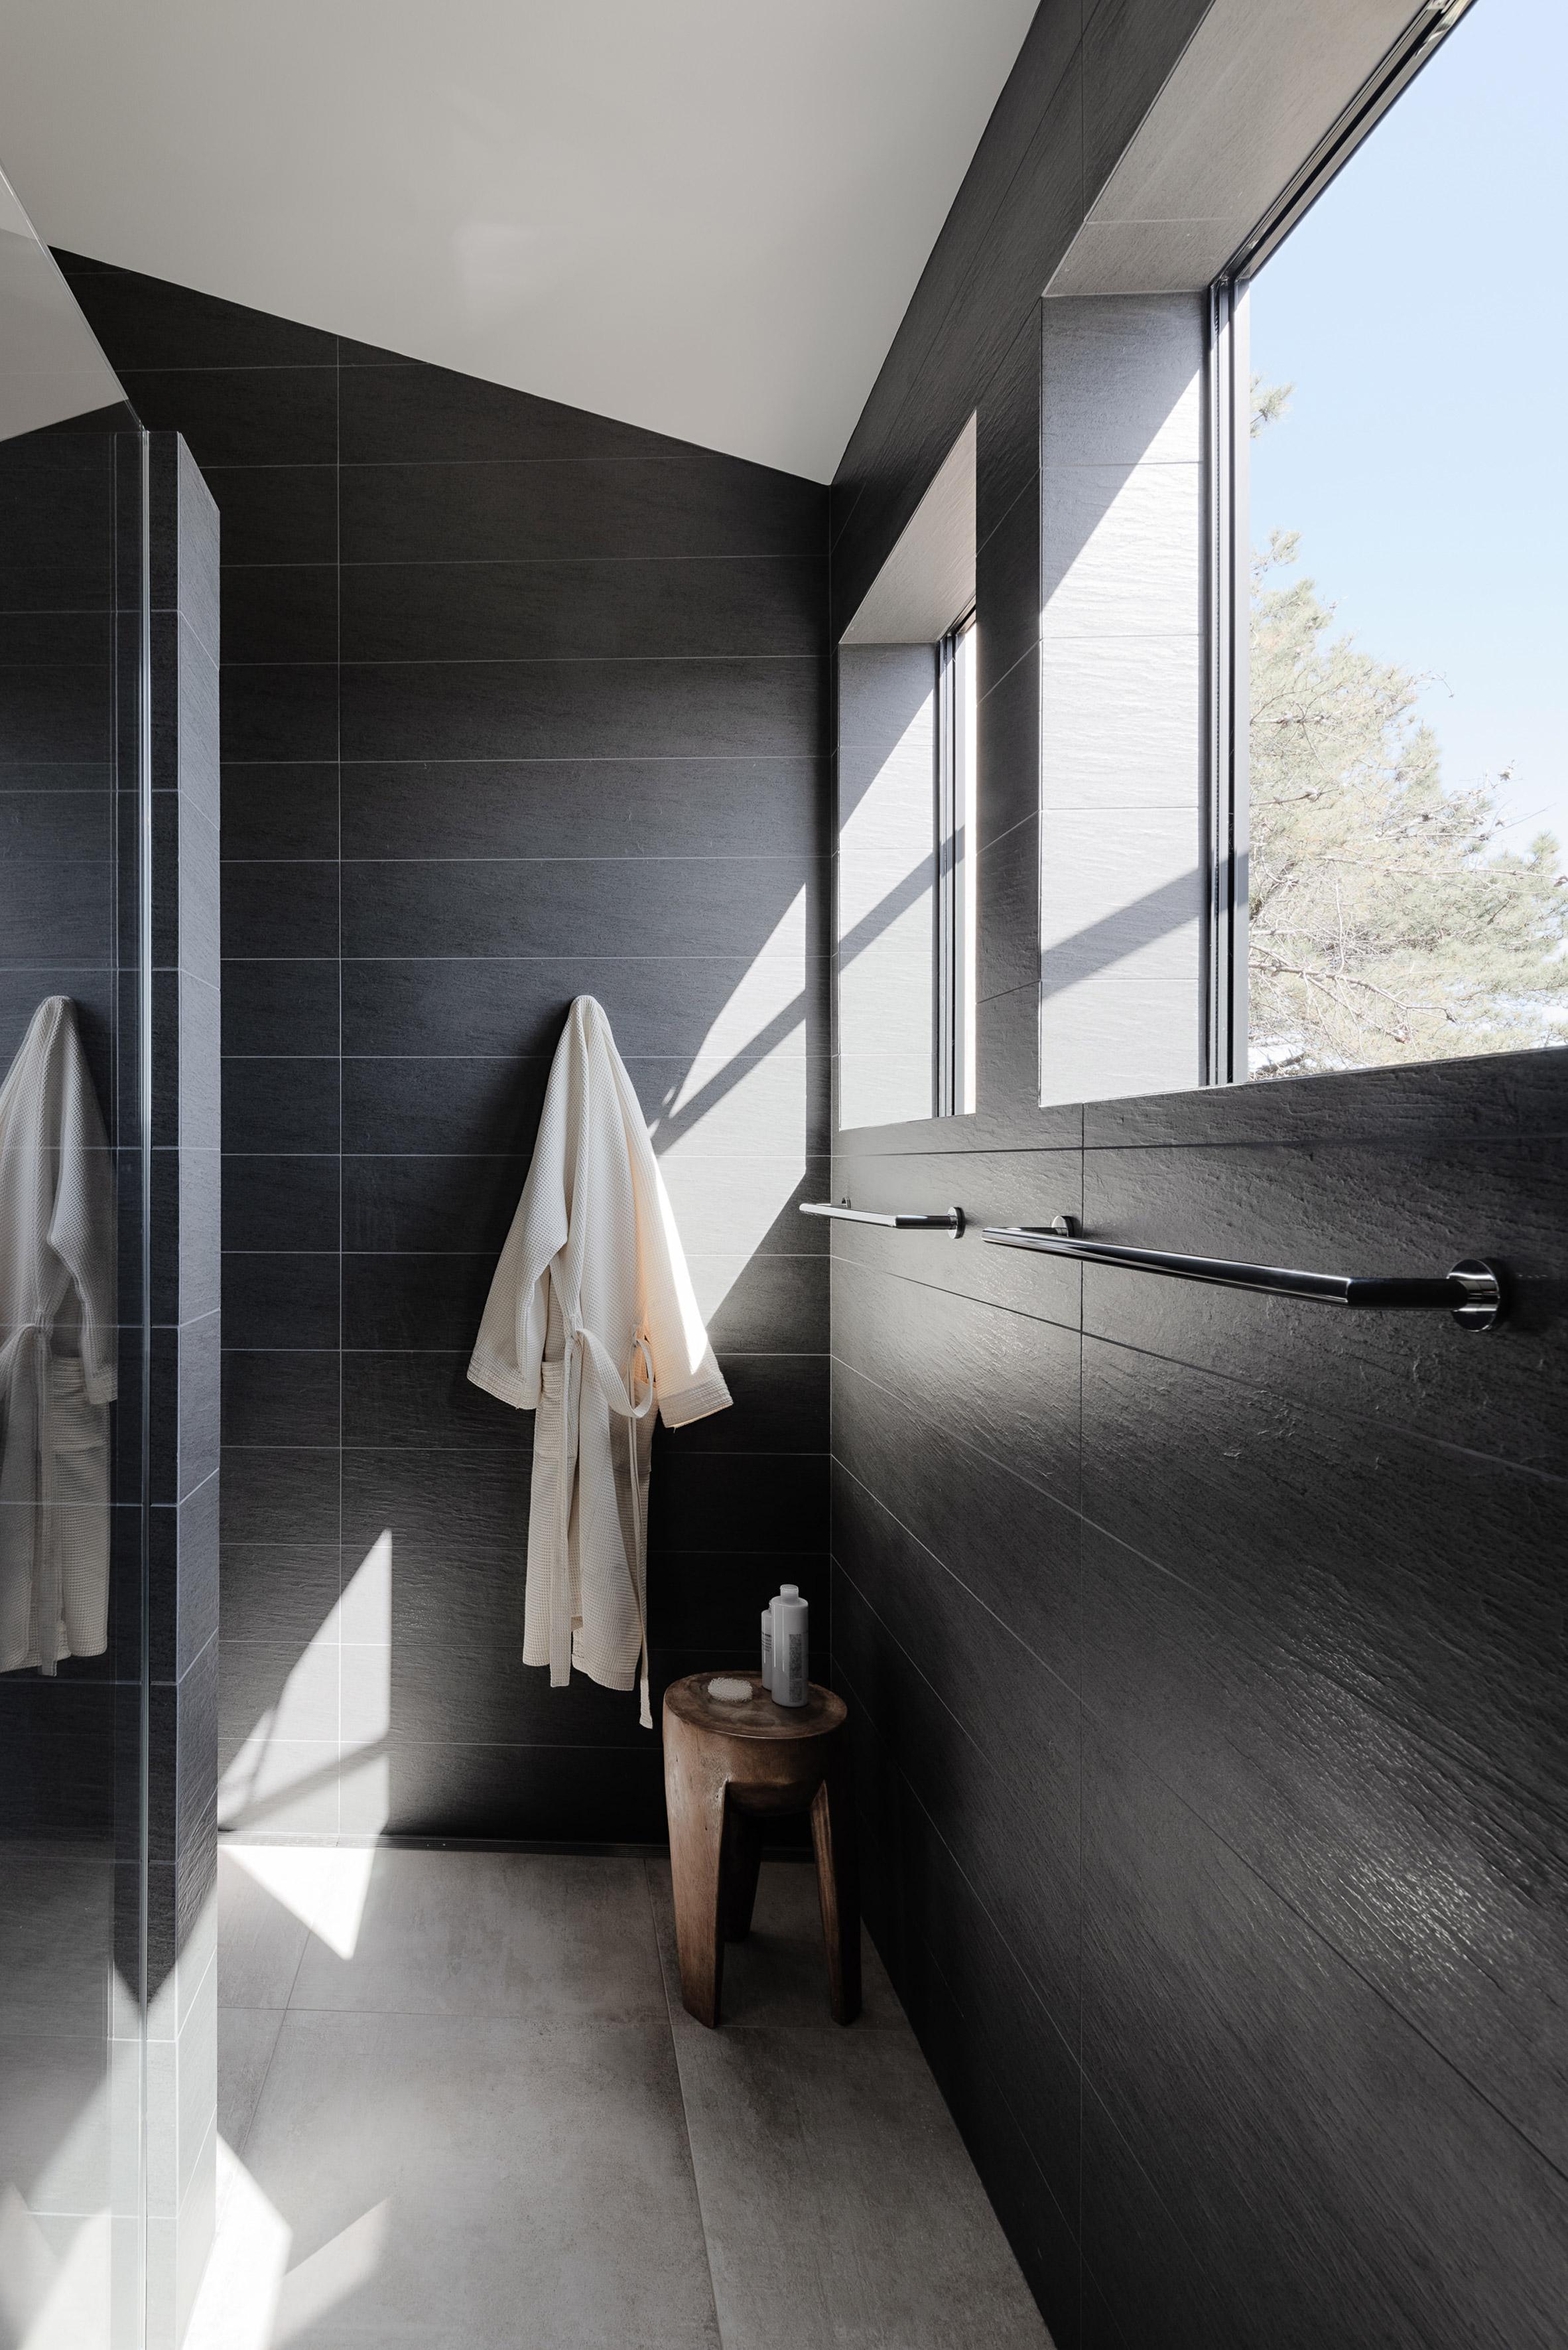 nhà bên biển coastal-retreat-malcolm-davis-architecture-sea-ranch-sonoma-county-califorinia-relaxing-space-elledecoration vn 13